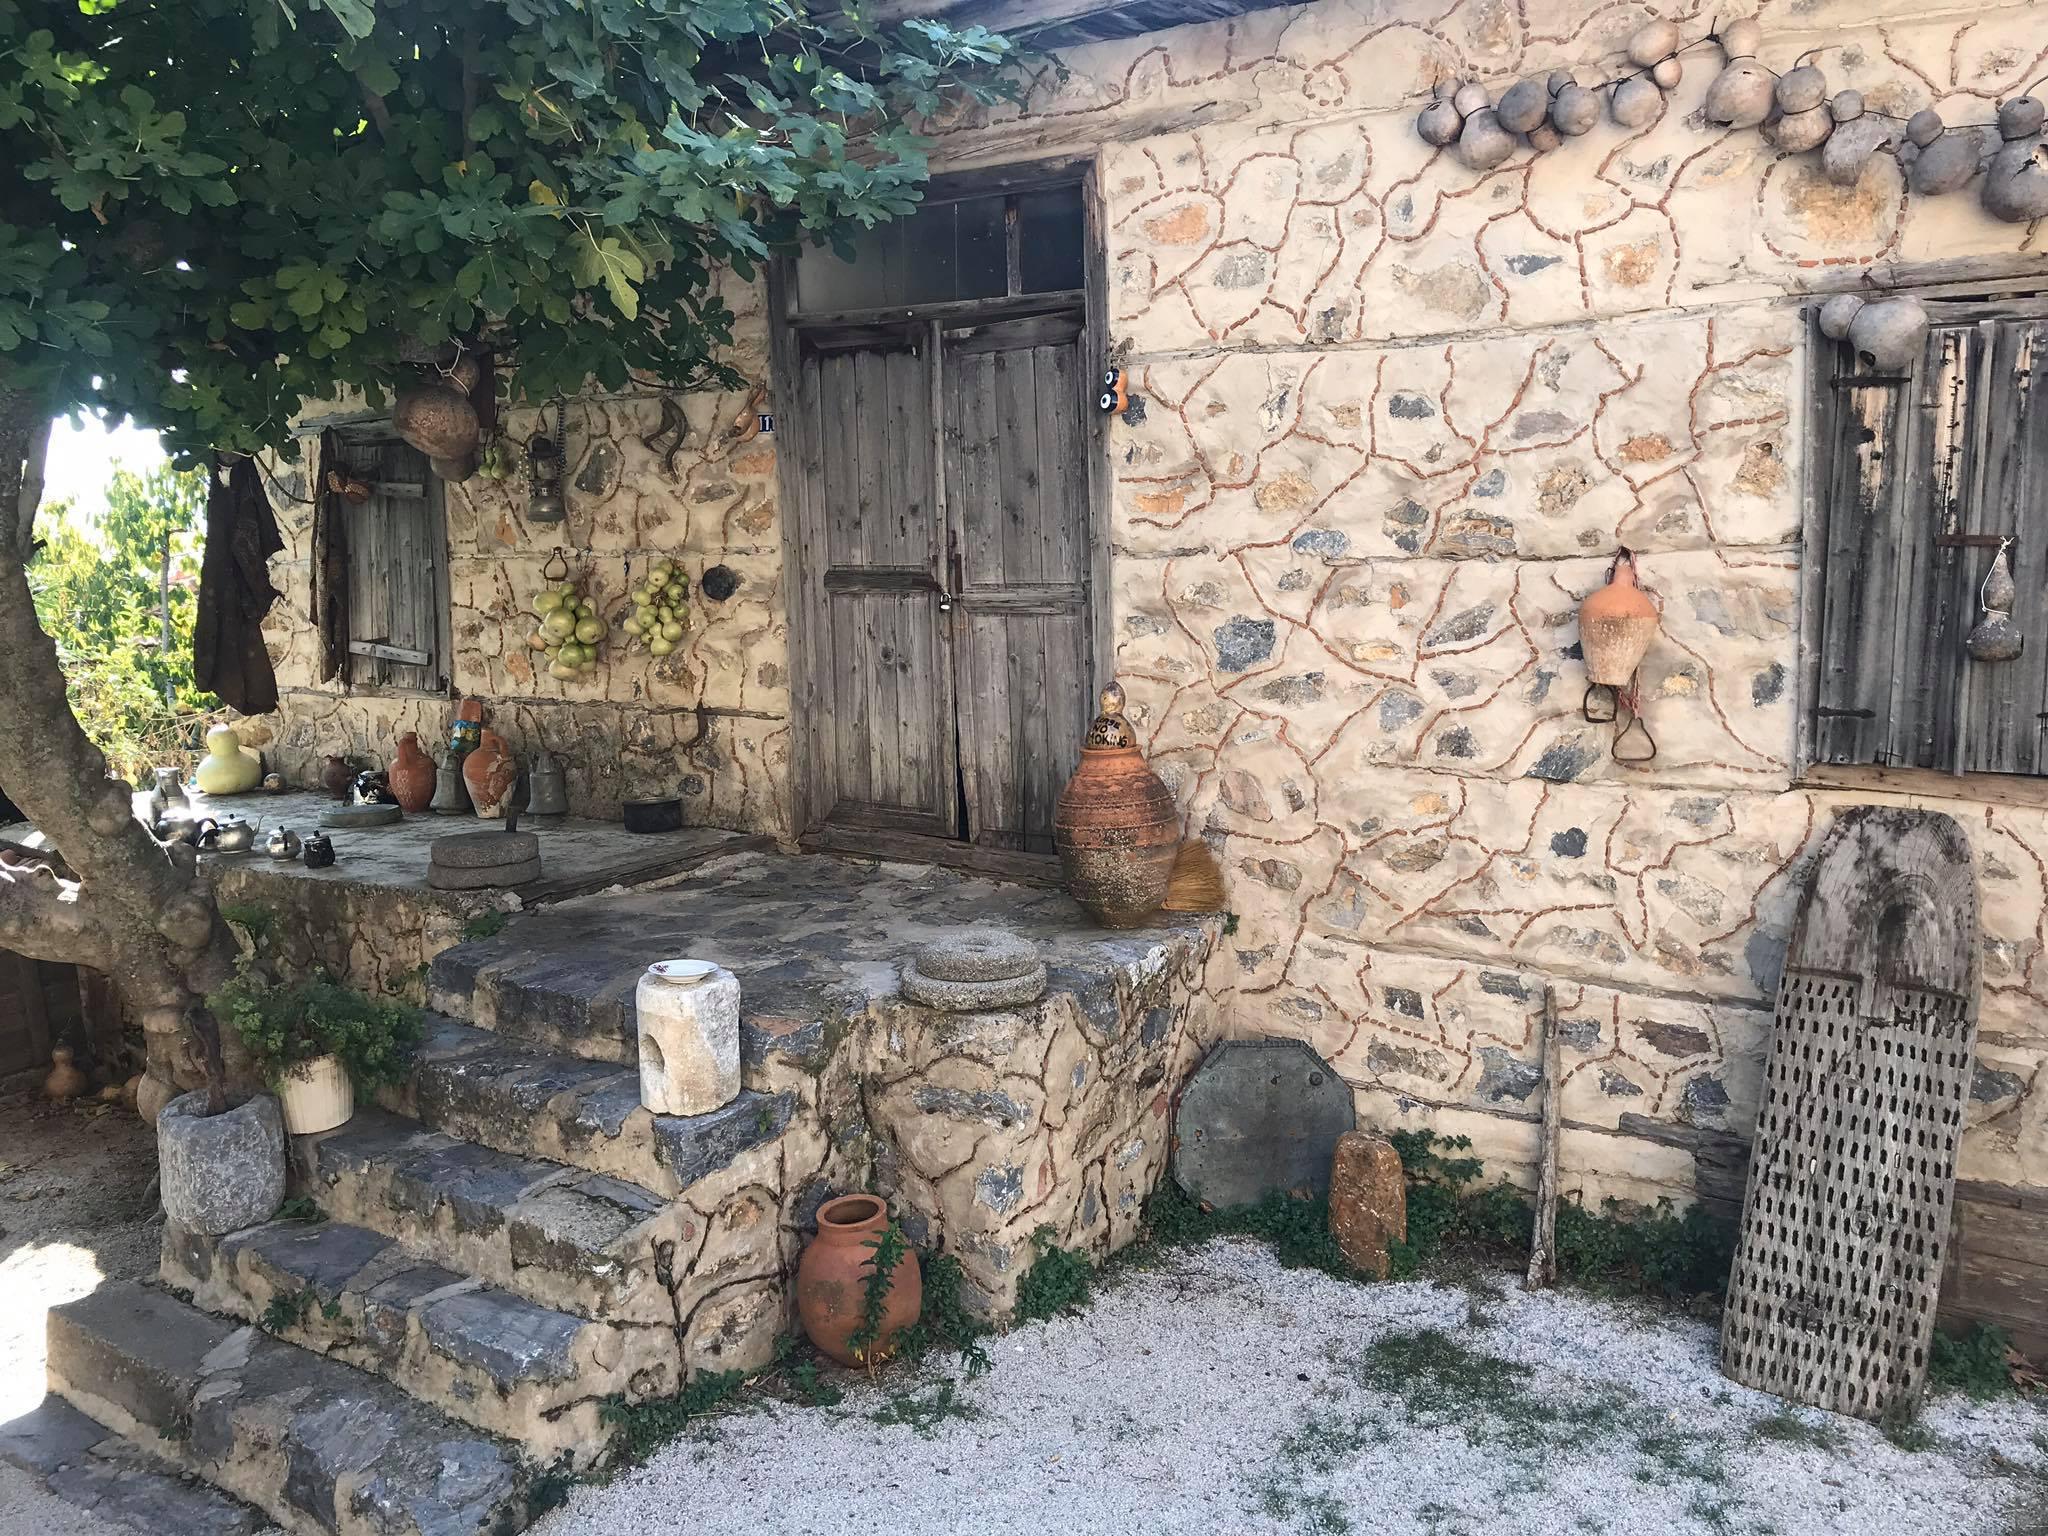 Mahmutseydi landsby- tyrkisk landsbyidyl nær Alanya